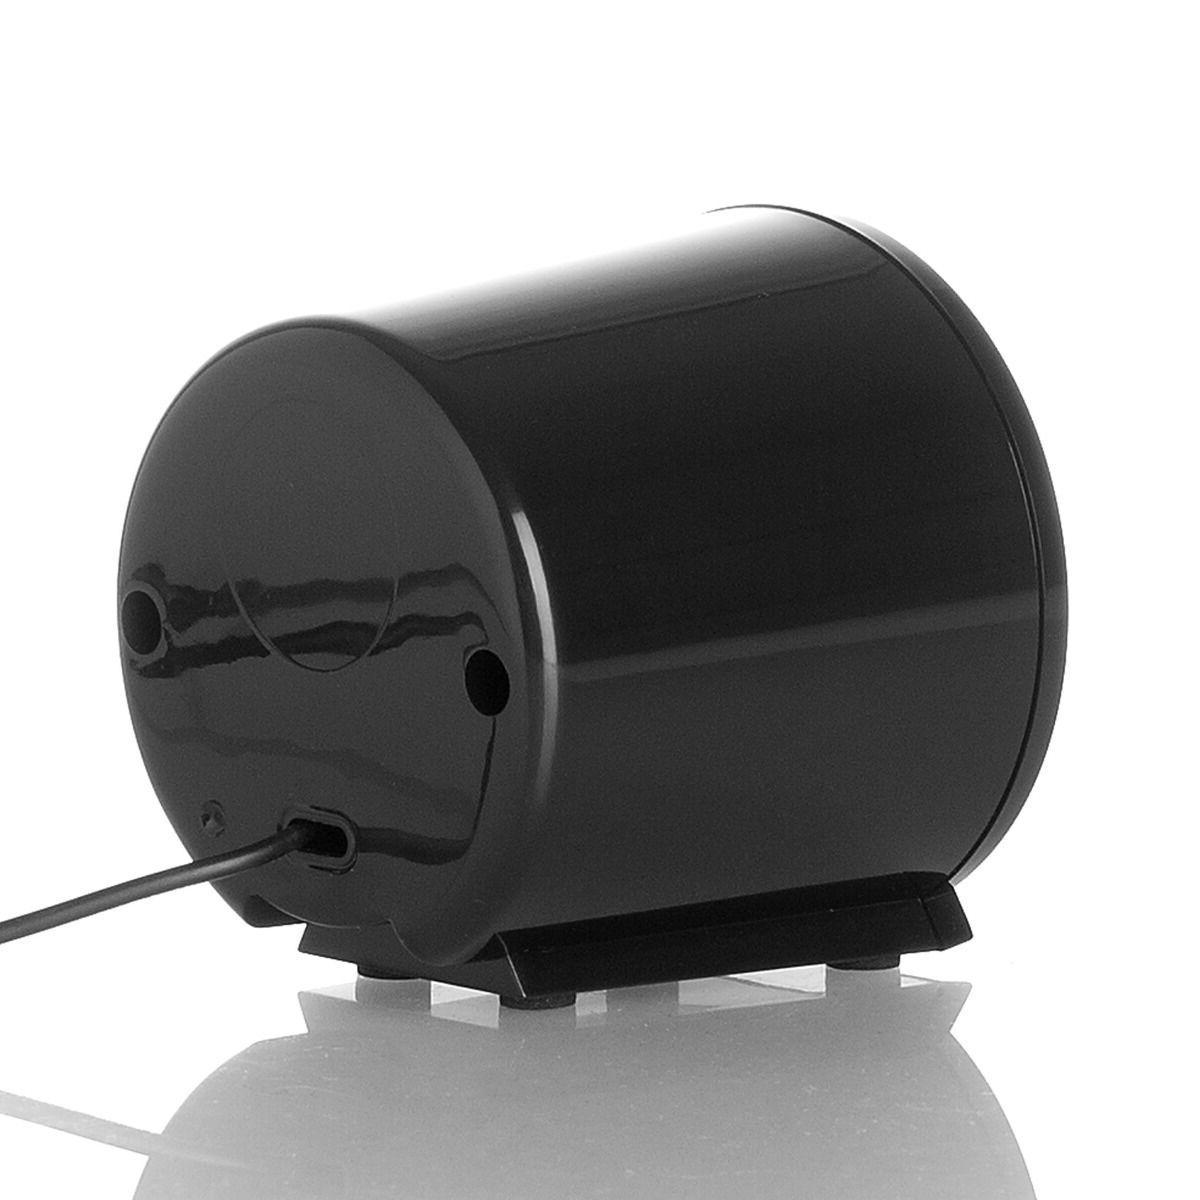 Frisby USB 2.0 Notebook Desktop Portable Speaker